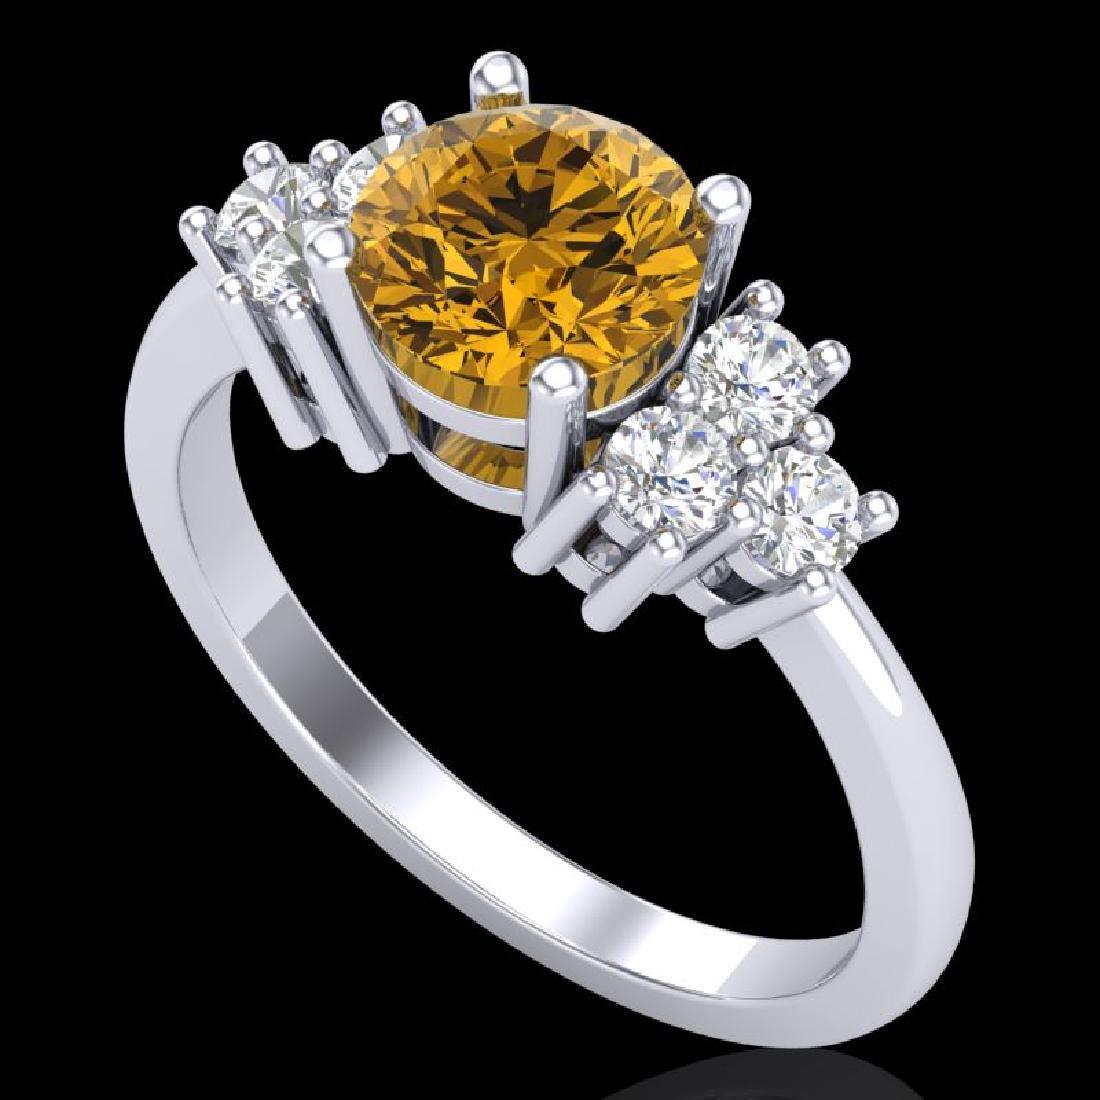 1.5 CTW Intense Fancy Yellow Diamond Solitaire Classic